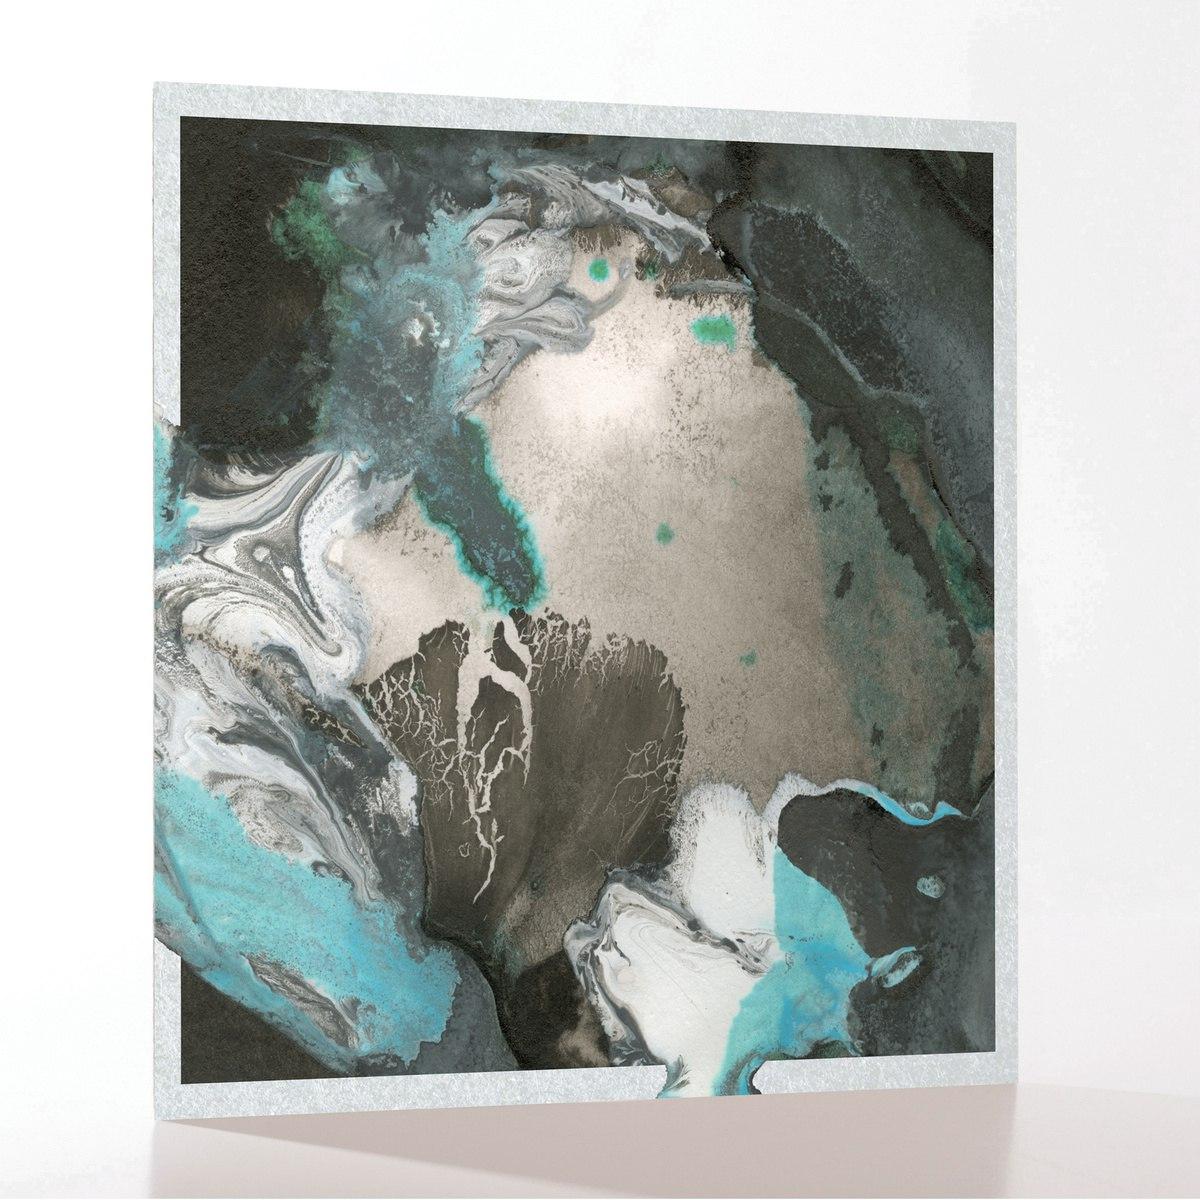 Alix Perez - Recall & Reflect EP